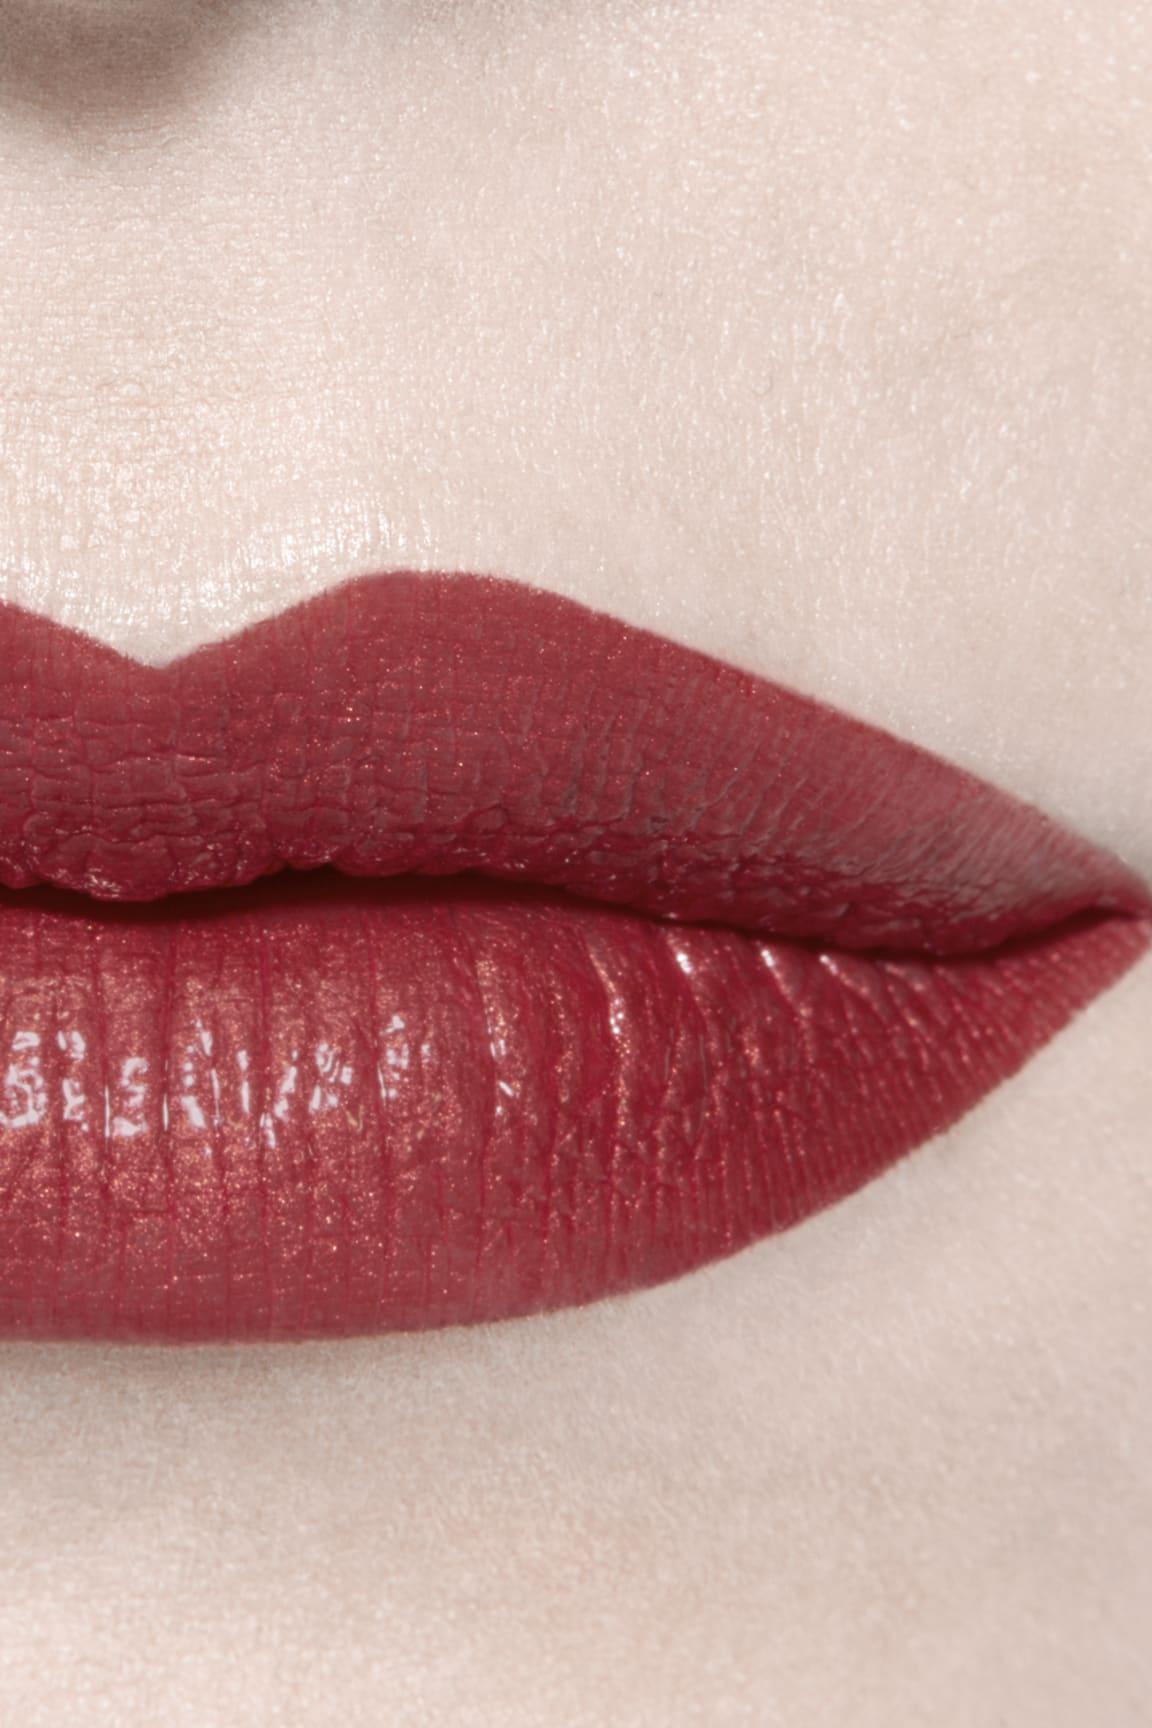 Application makeup visual 3 - ROUGE ALLURE LAQUE 84 - ROSE AMBIGU